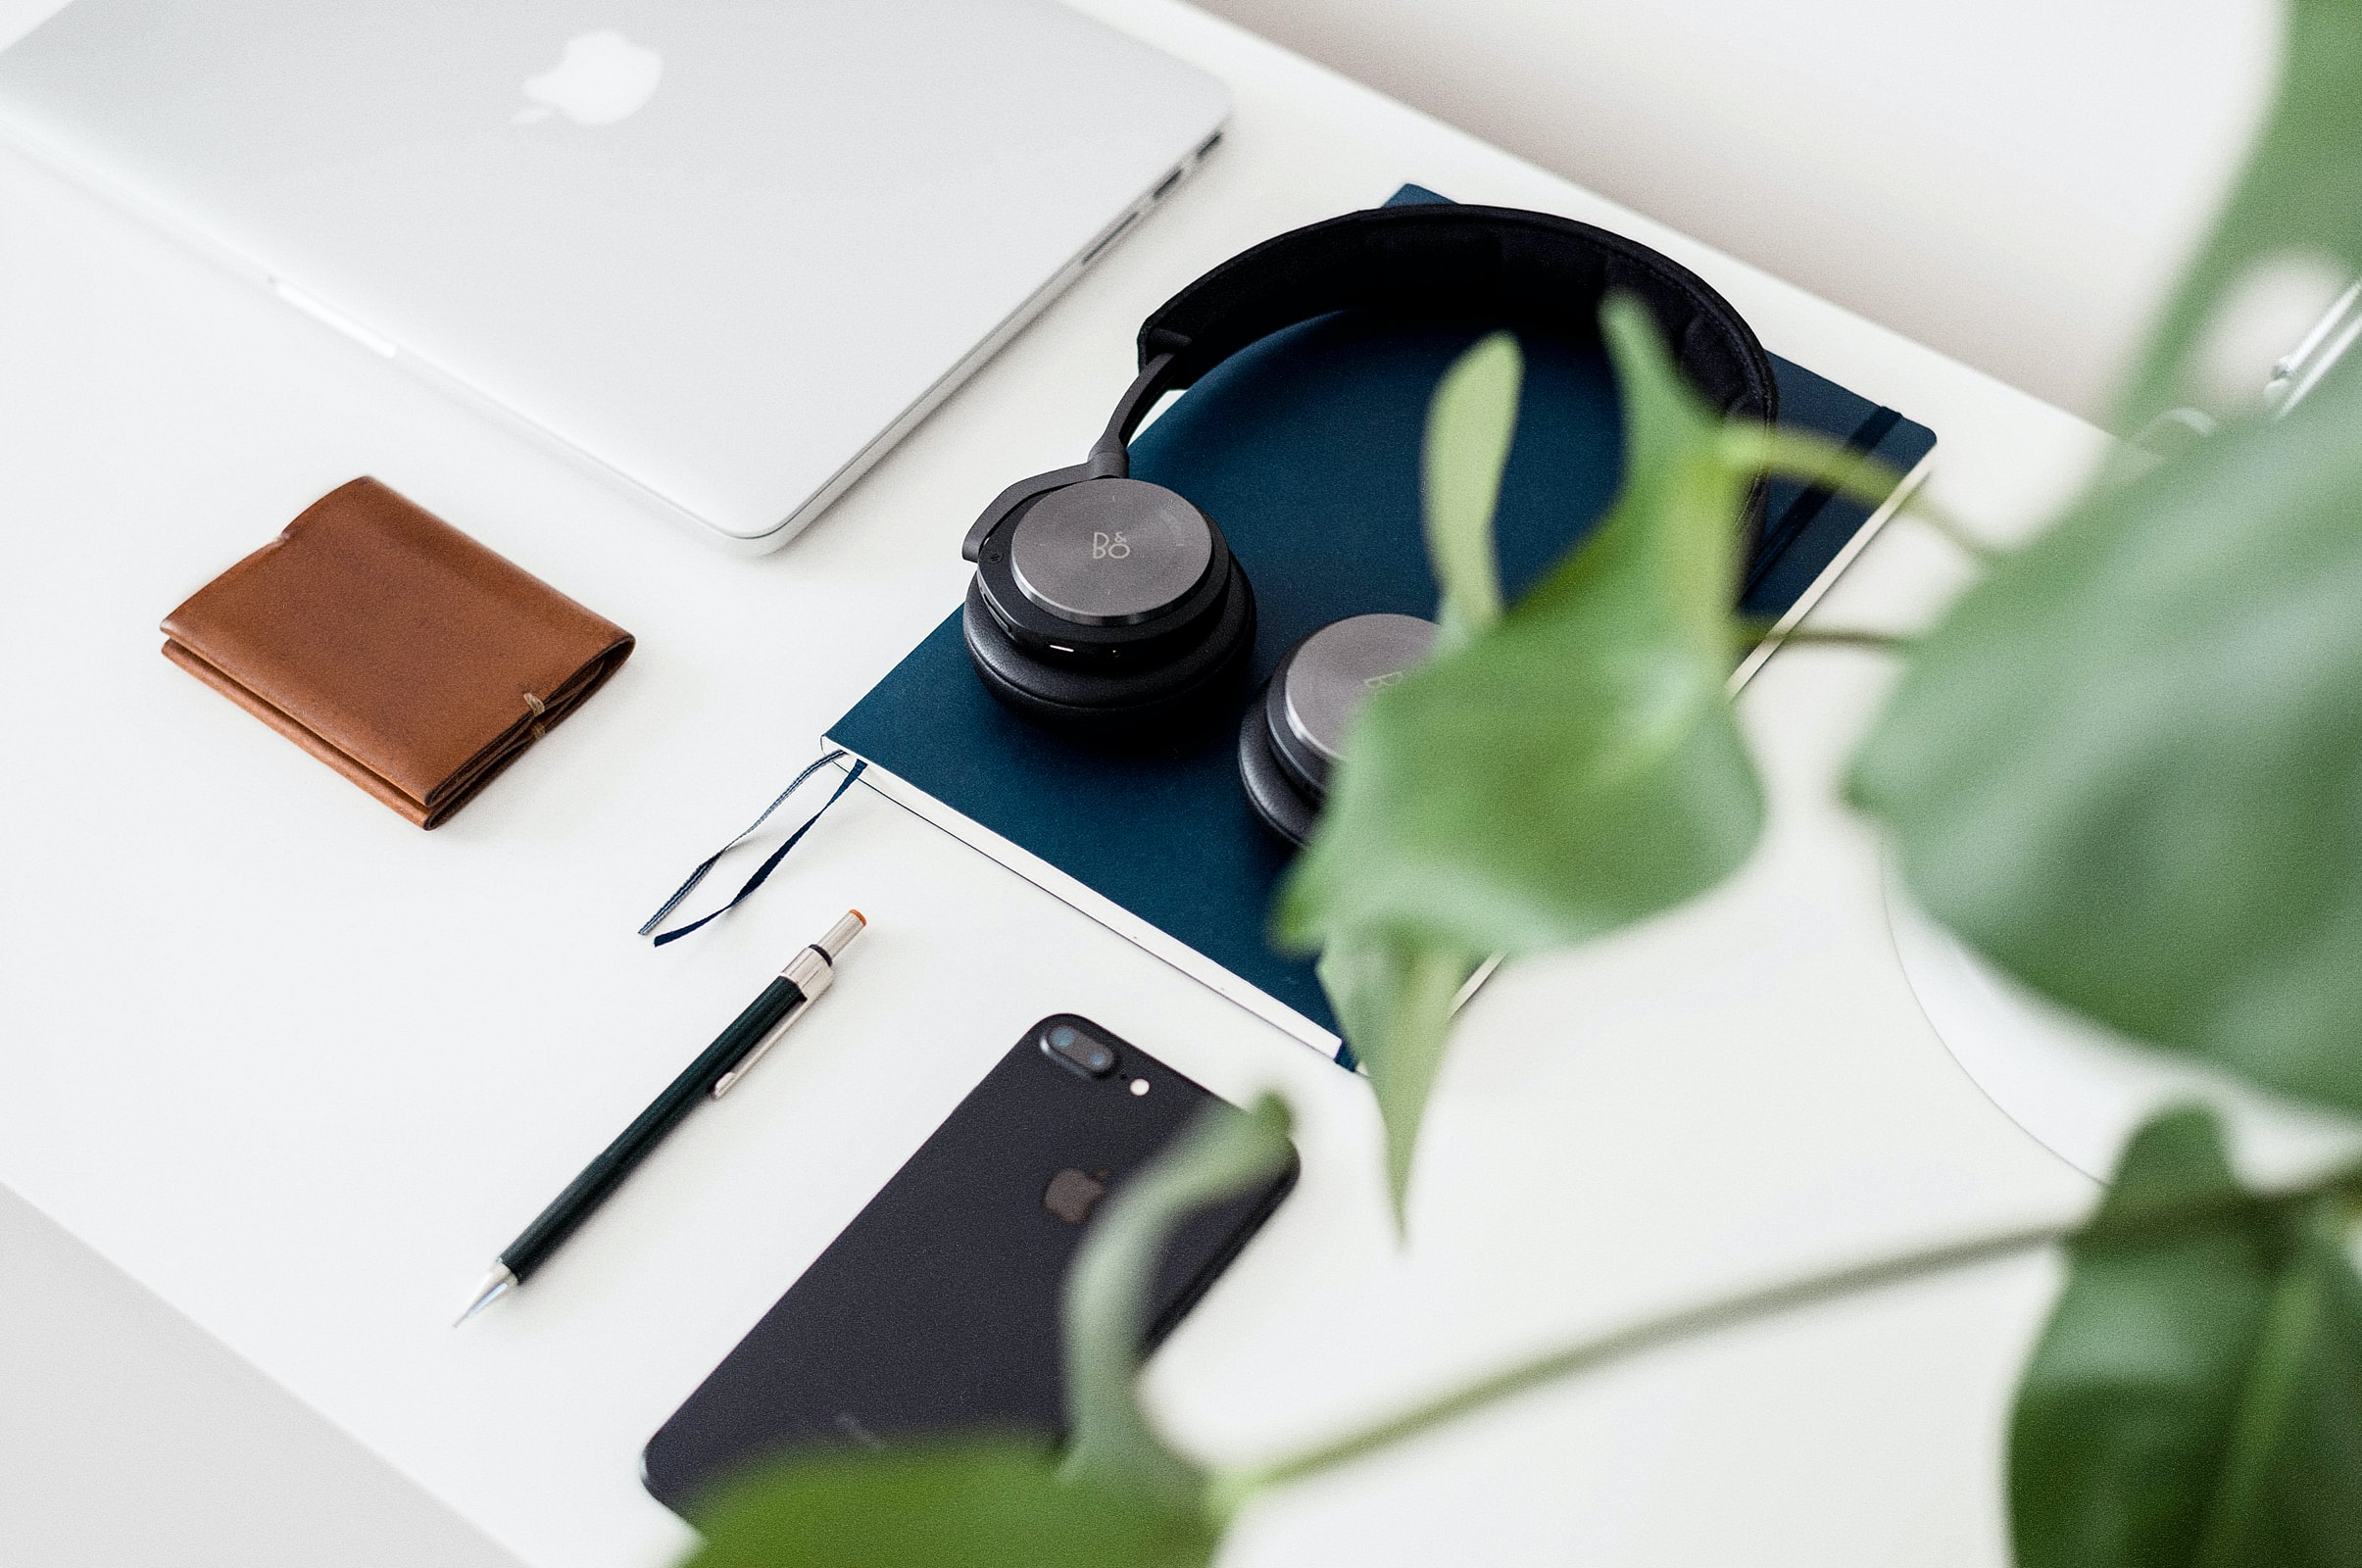 Arrangement of headphones, a phone, a laptop, a notebook, a wallet and a pen on a white desktop